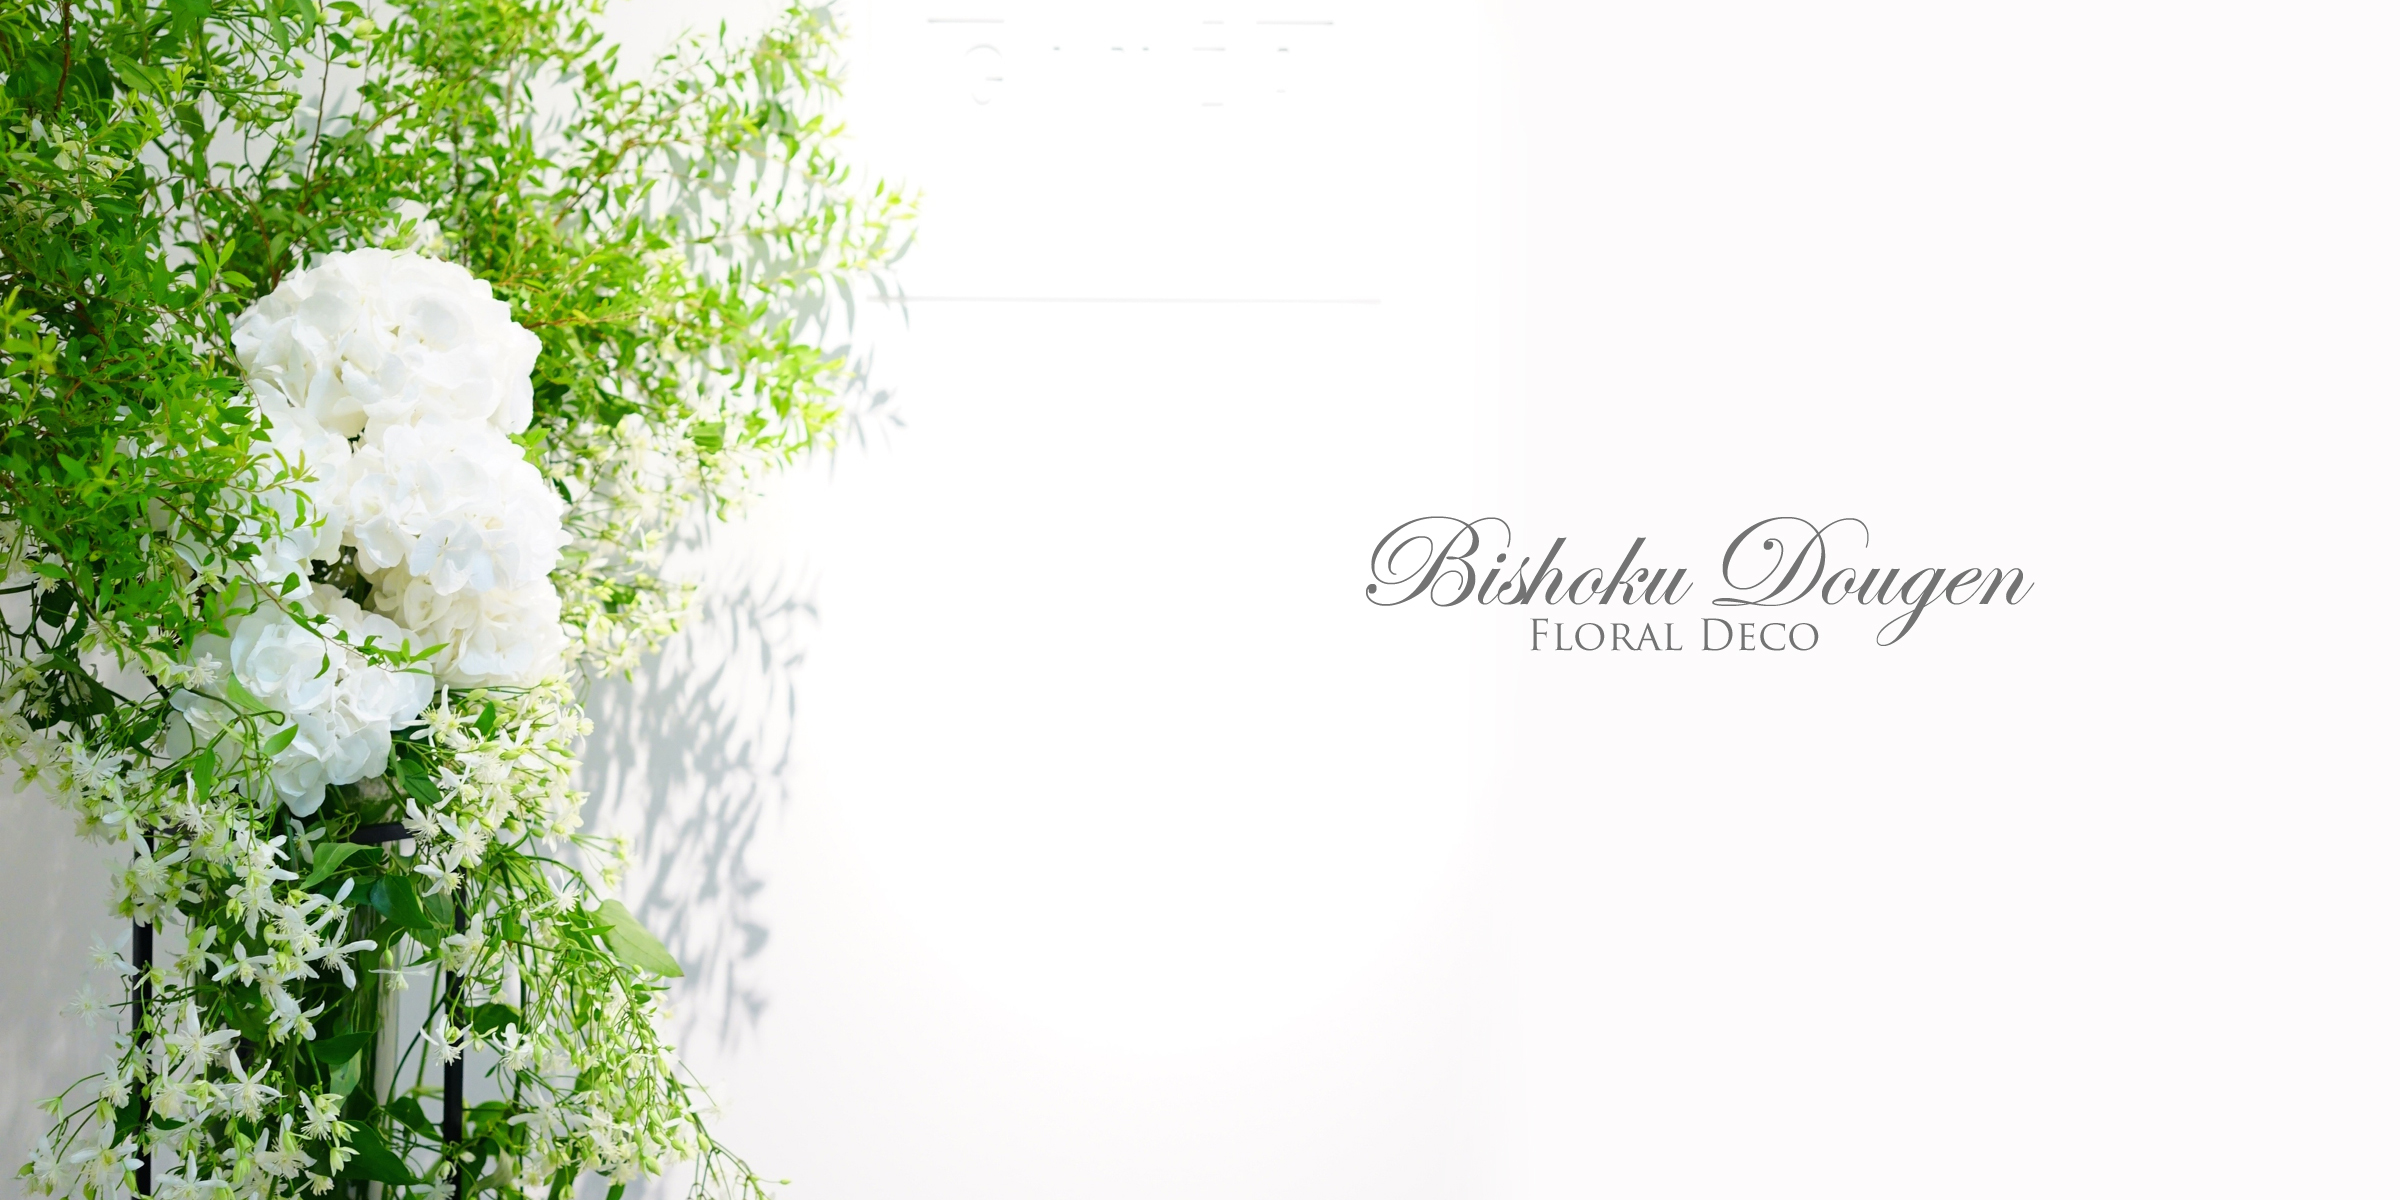 shiseido&dazzle